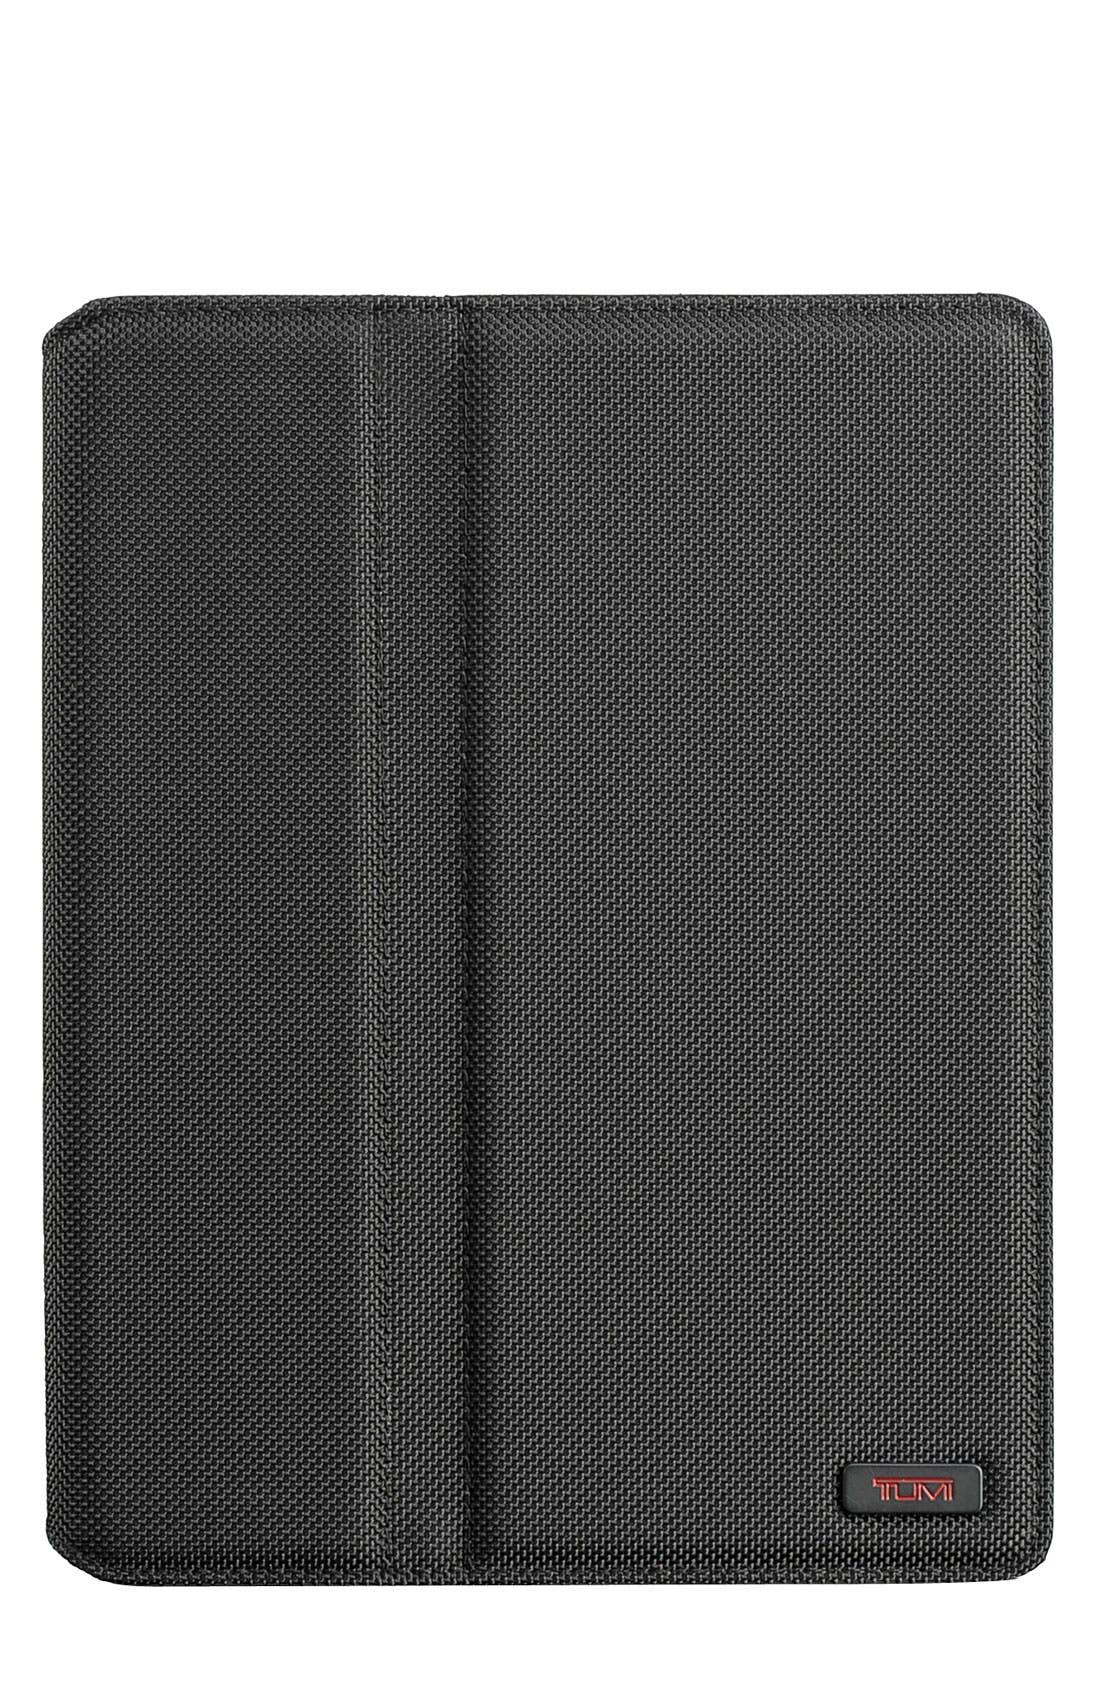 Ballistic Nylon iPad 2 Cover,                             Main thumbnail 1, color,